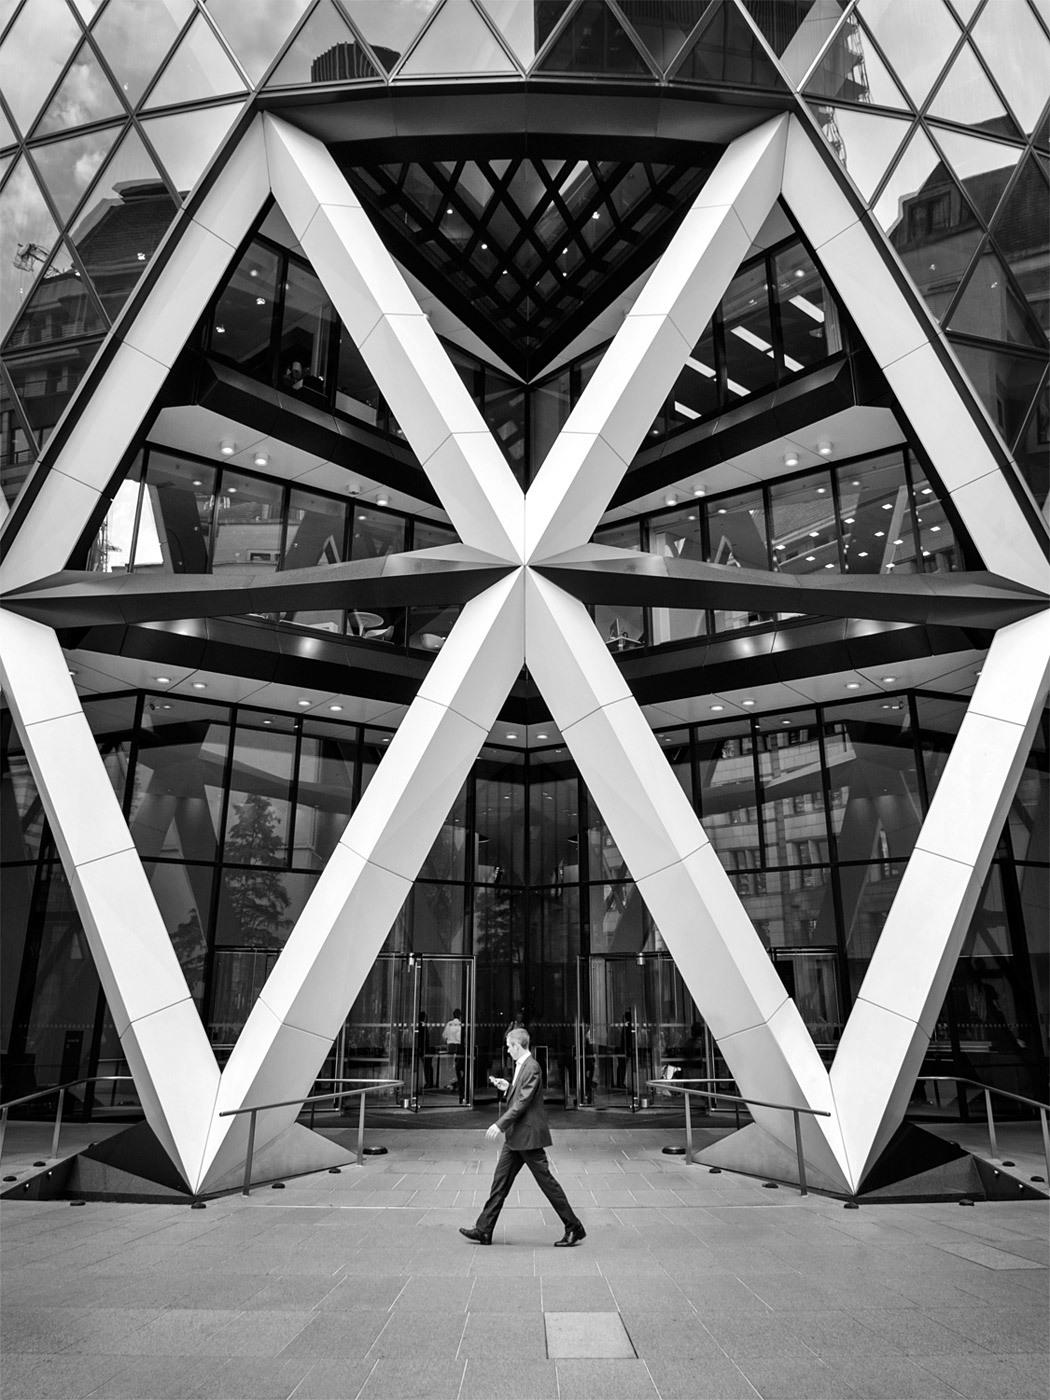 30 St Mary Axe, London. Architect: Norman Foster. © Edward Neumann / EMCN